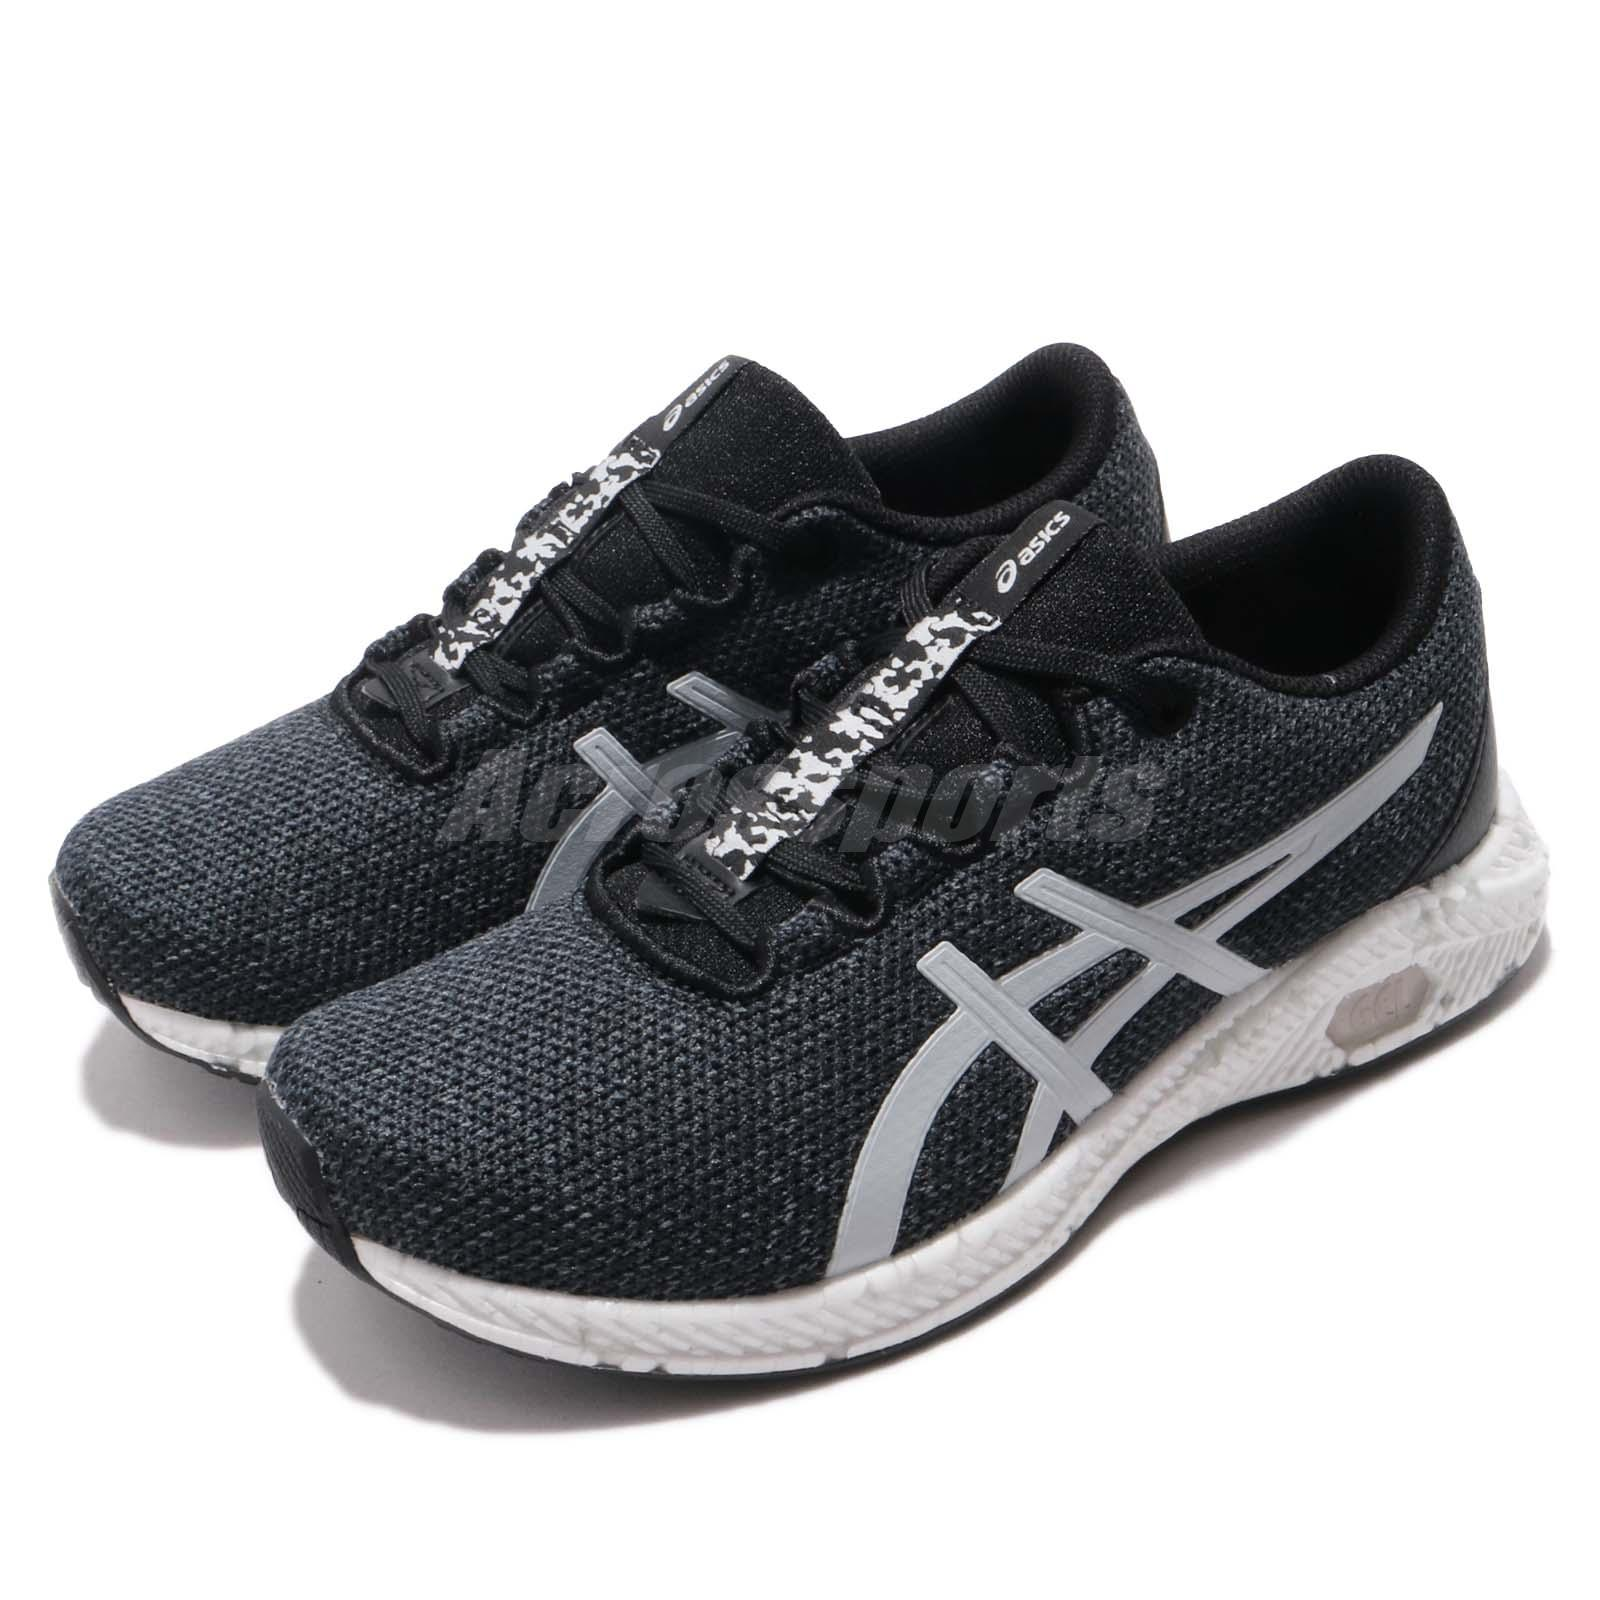 asics womens lifestyle shoes black